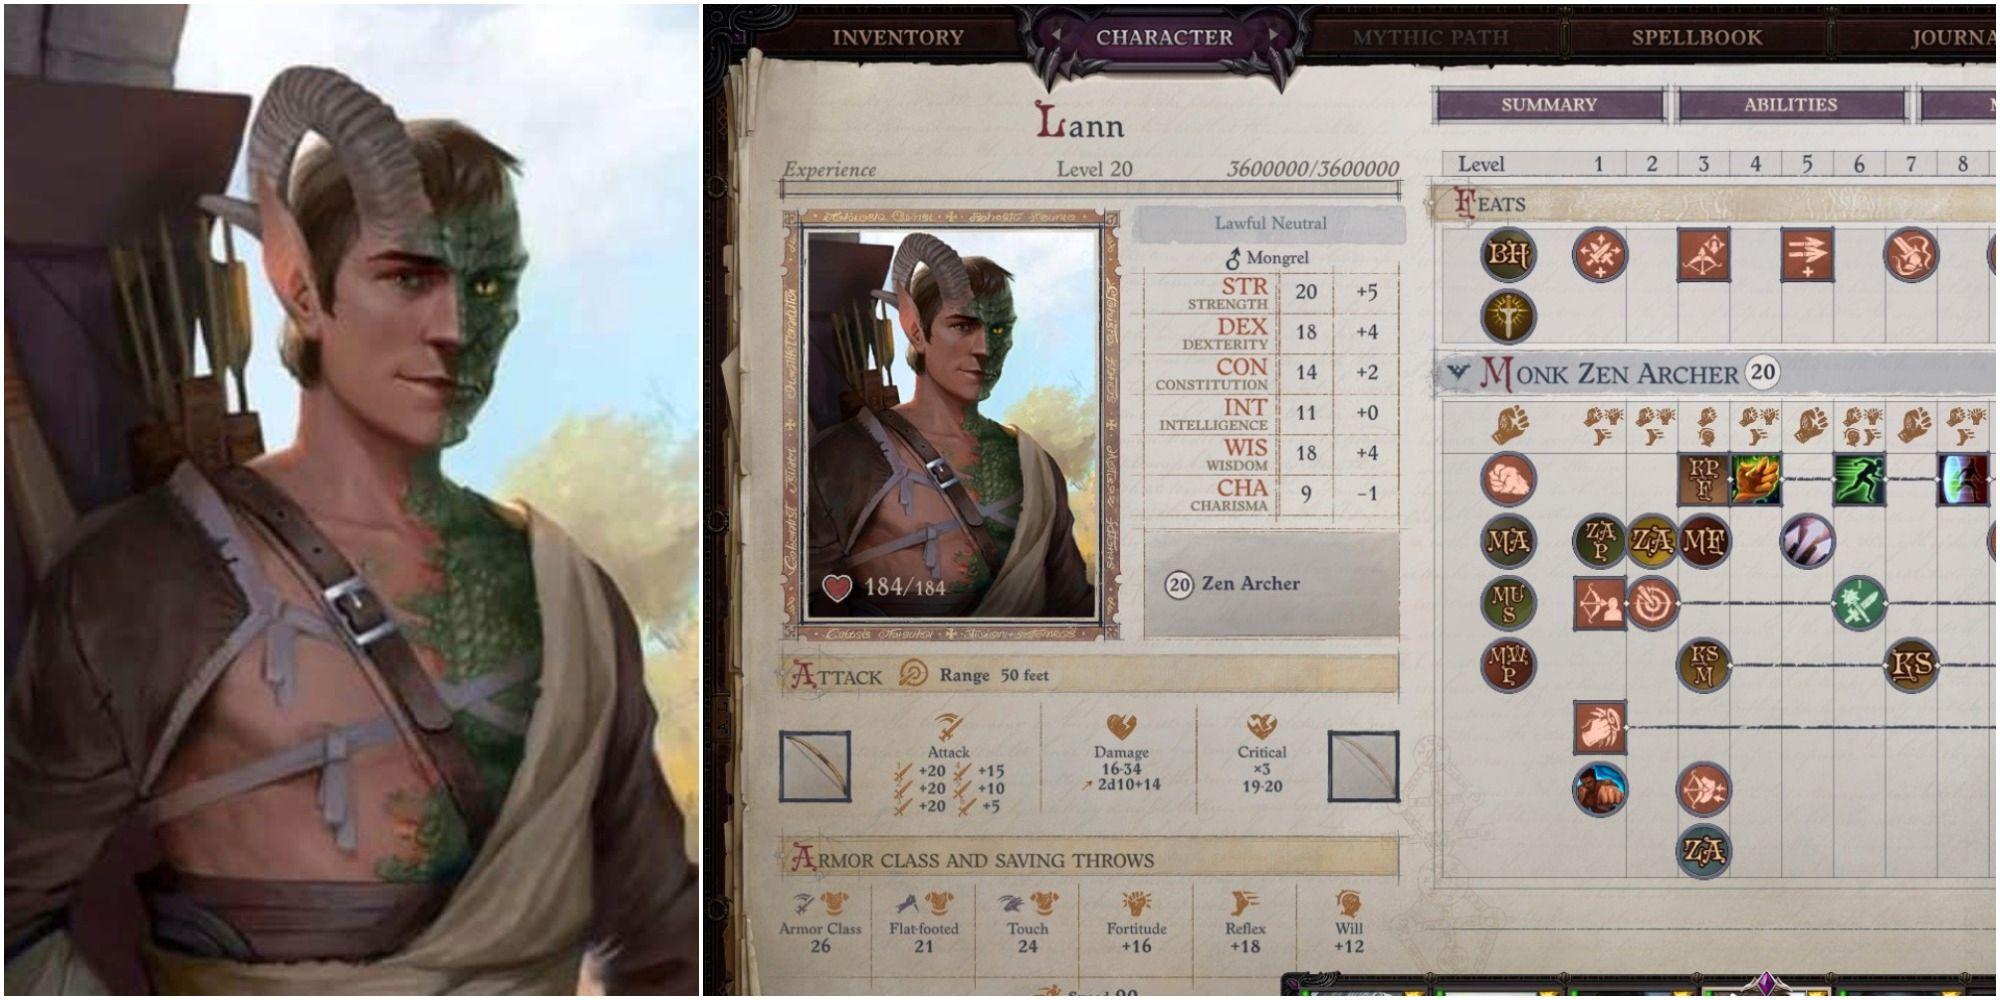 Pathfinder: Wrath of the Righteous - Mejores construcciones de Lann